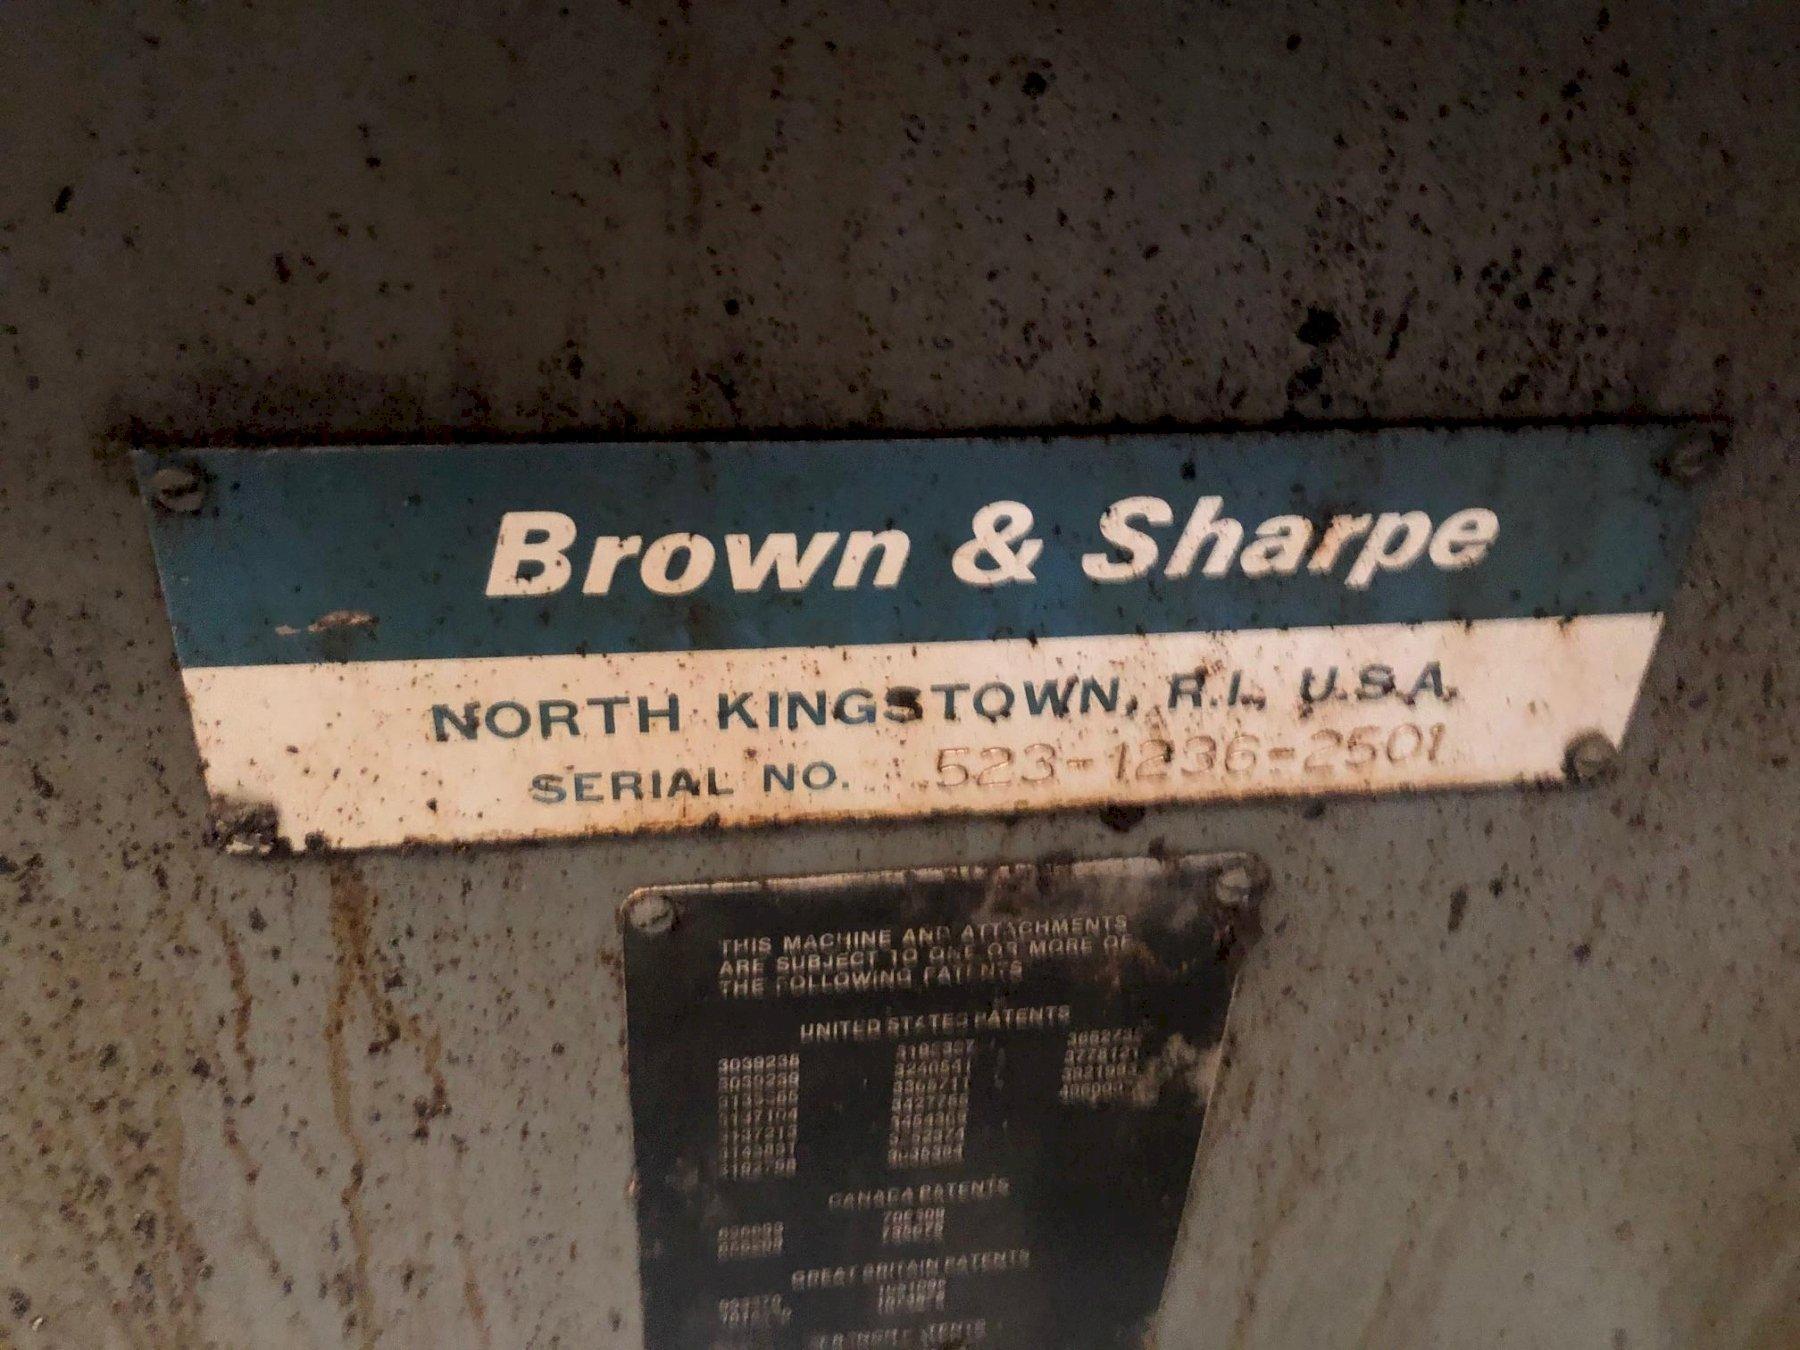 "BROWN & SHARPE 12"" X 36"" MICROMASTER CNC"